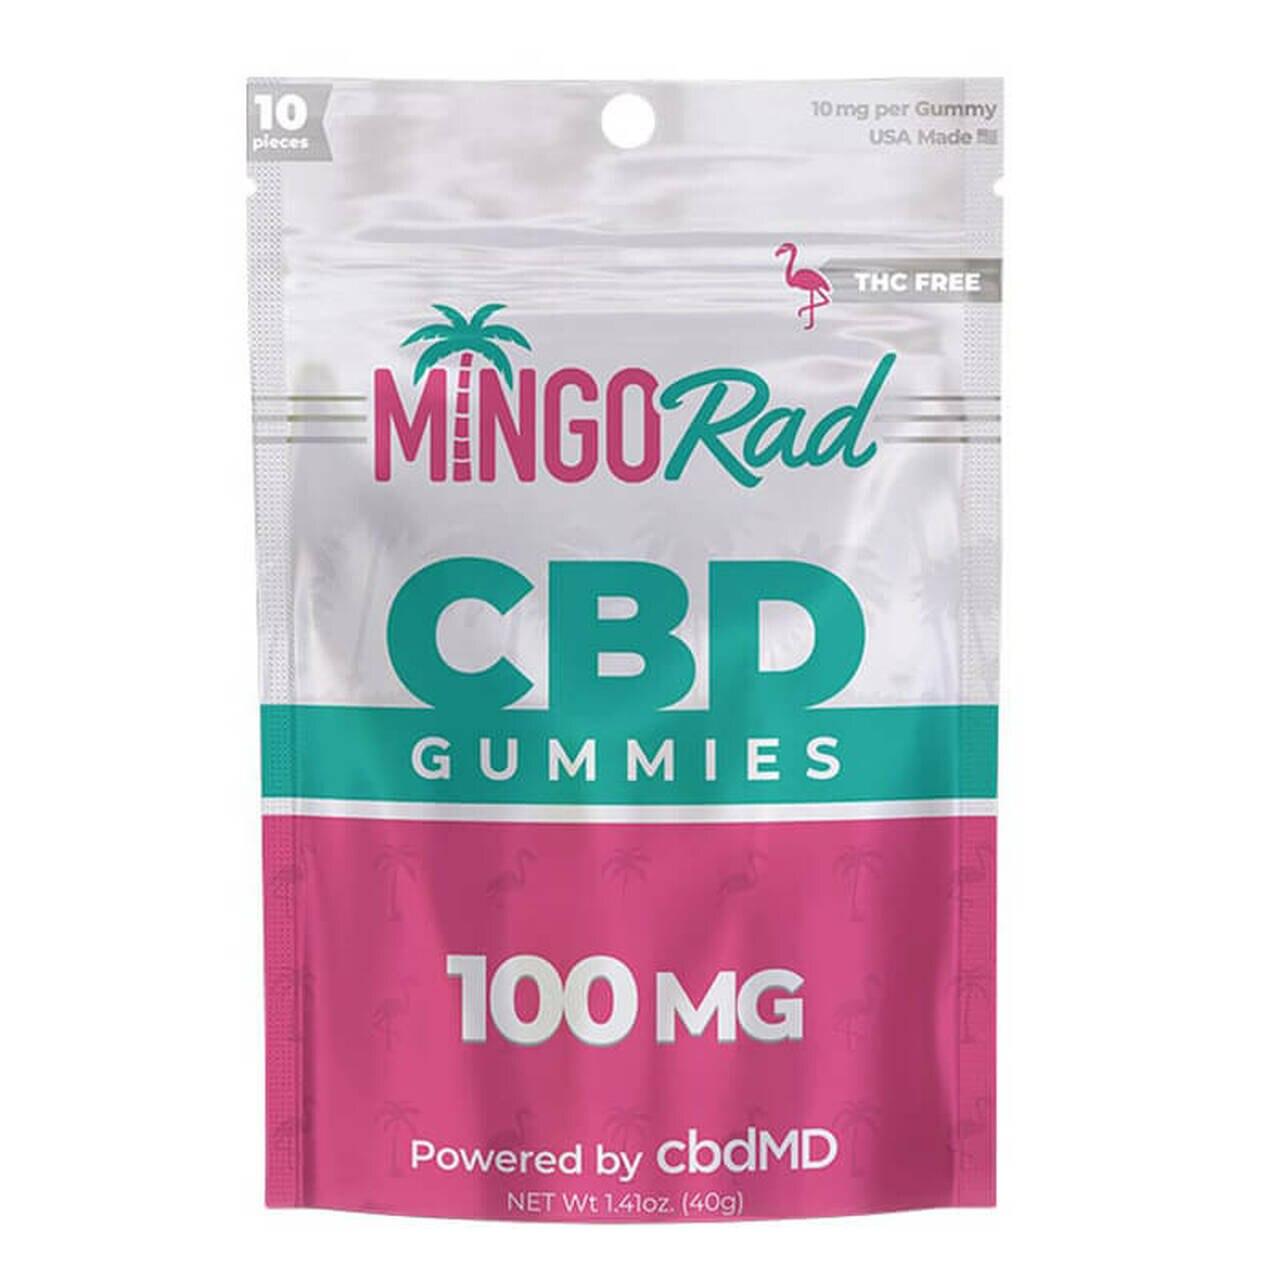 Mingo Rad Broad-Spectrum Gummies 10mg